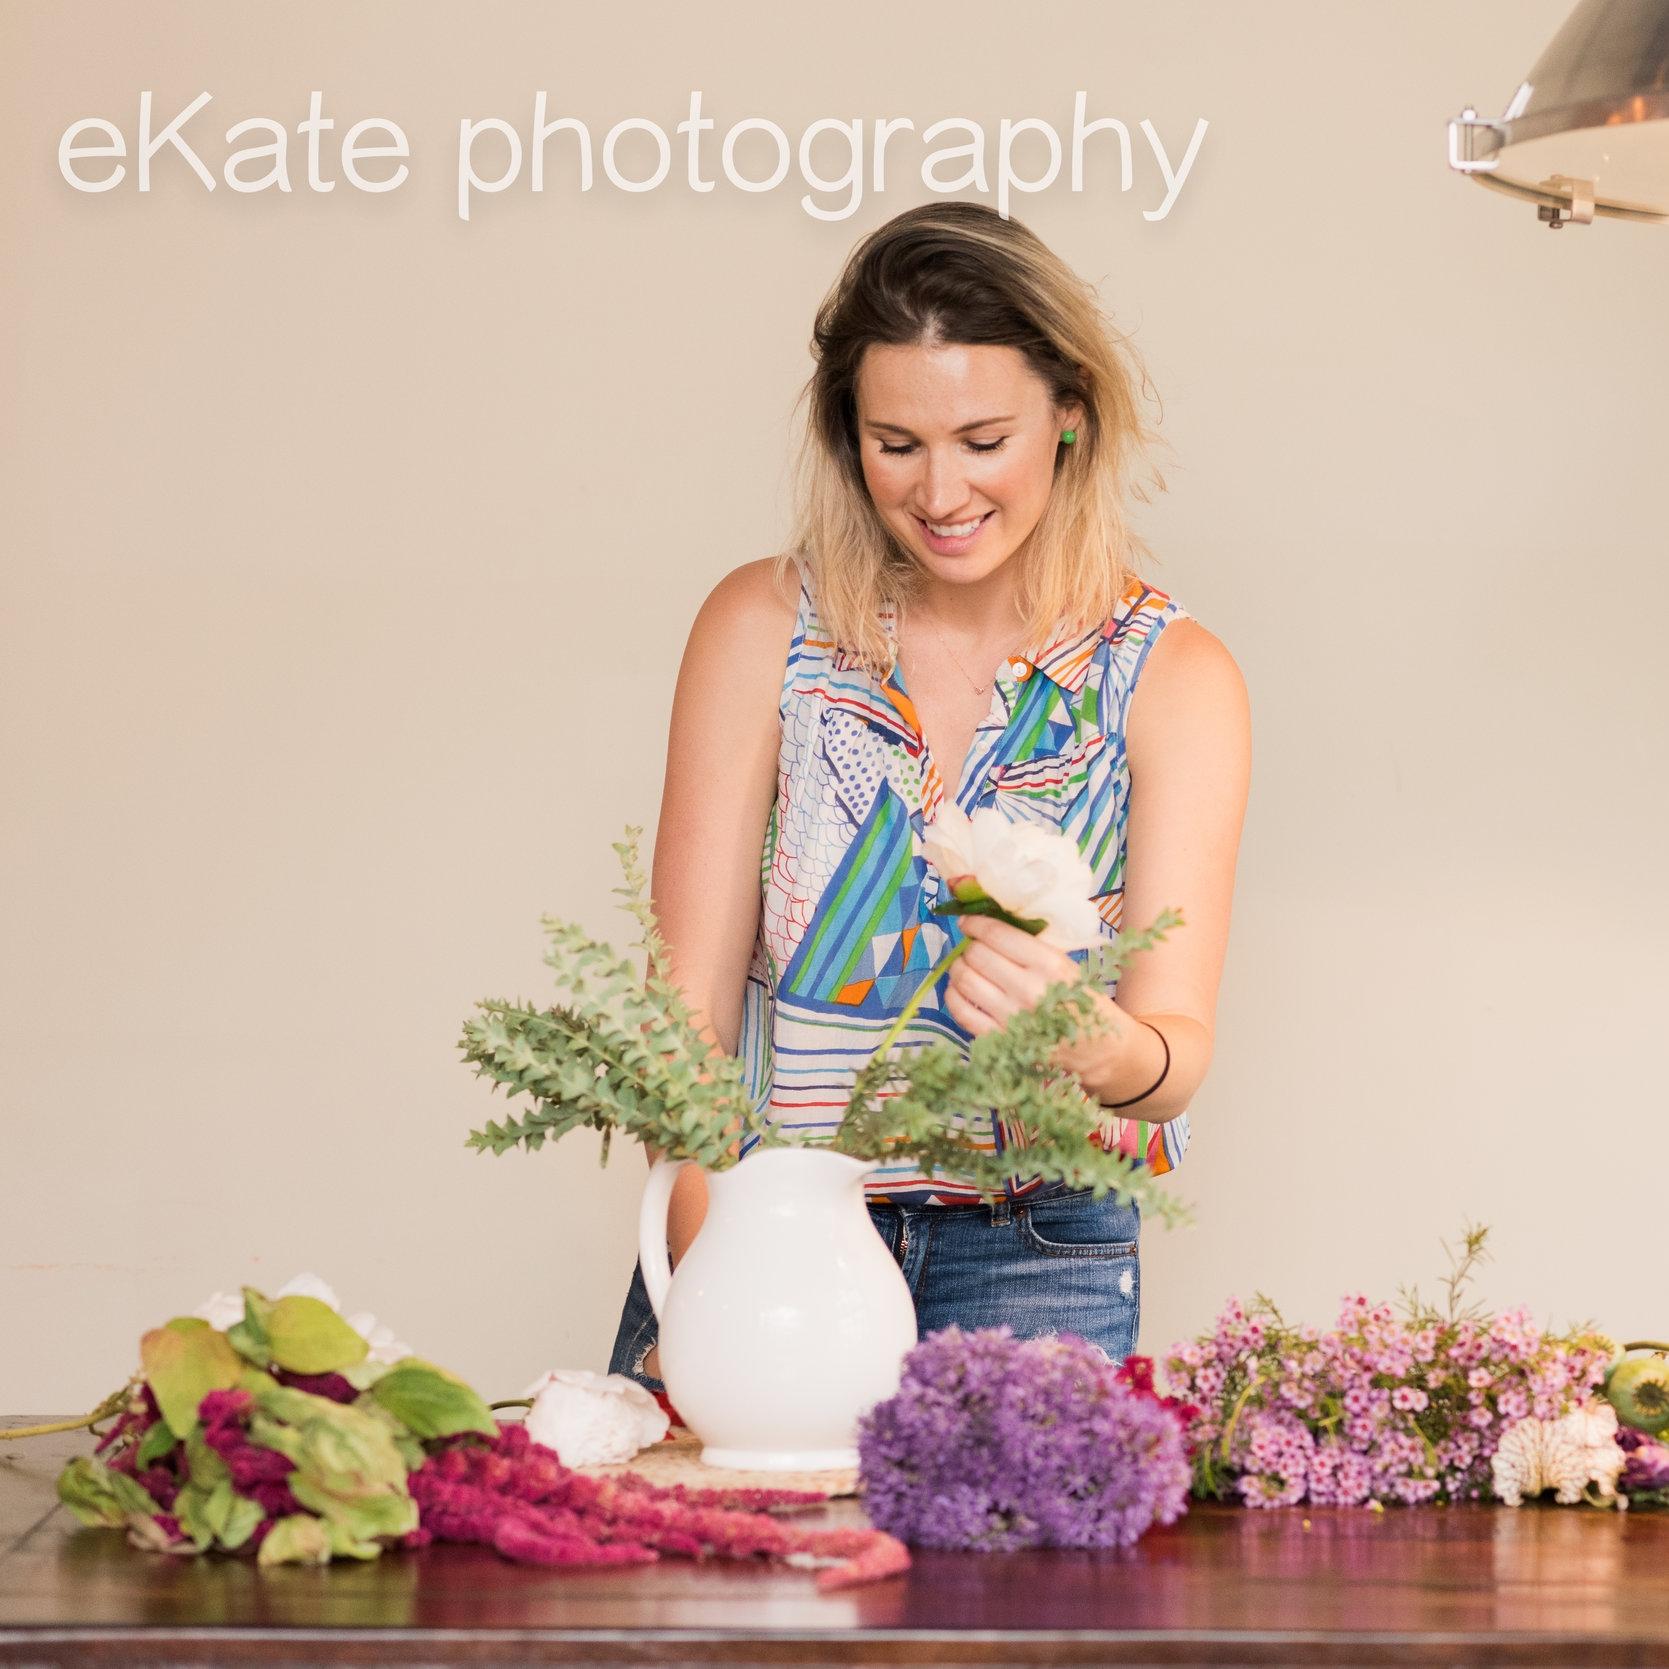 eKate Photography